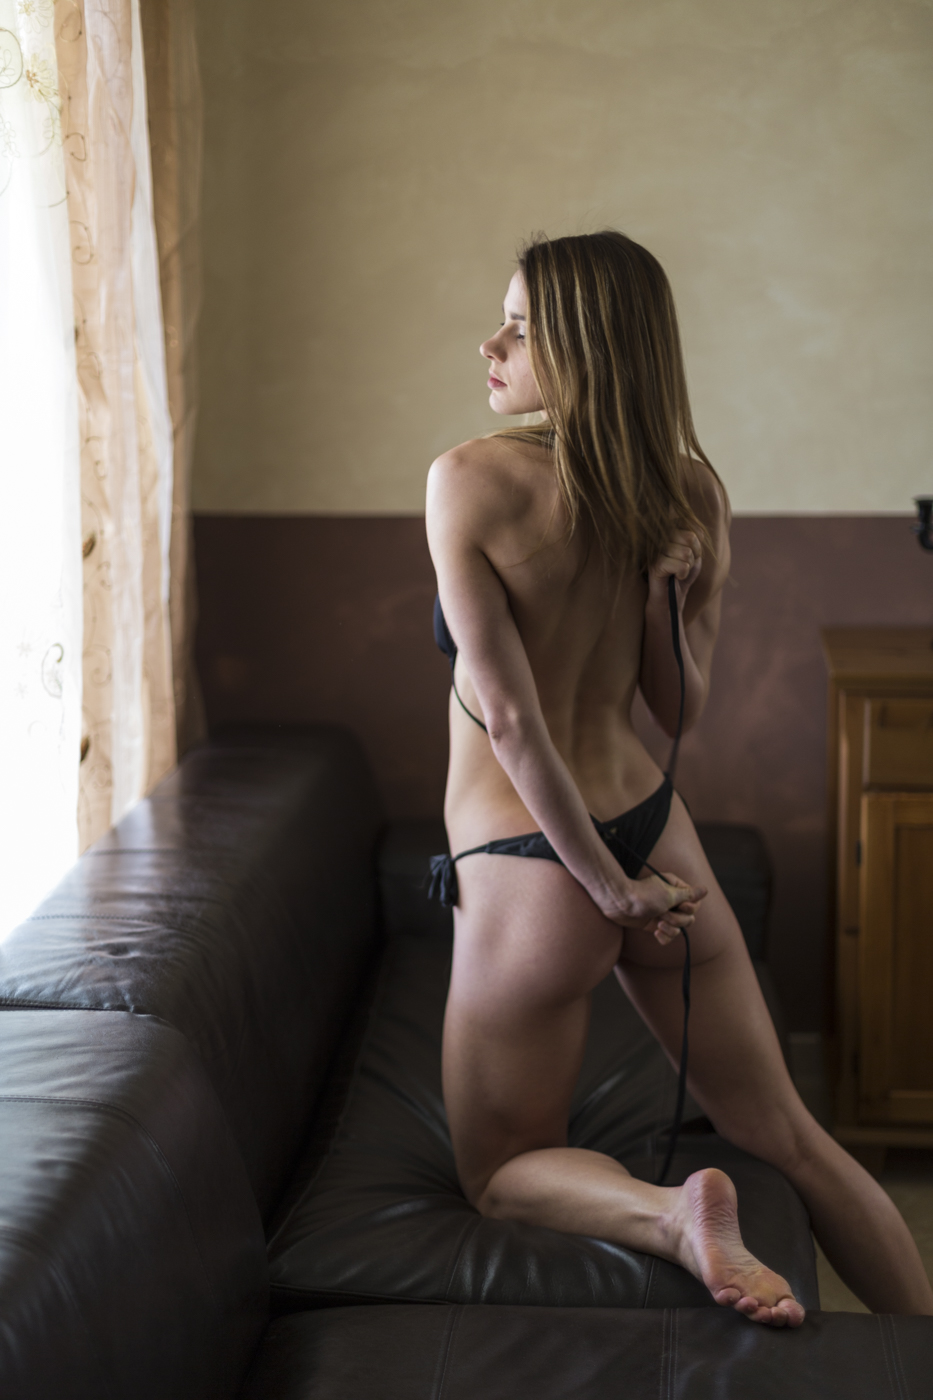 Julia et studio Editorials  nudes nude art models model lionsmag lingerie Johan Famel editorial babes art